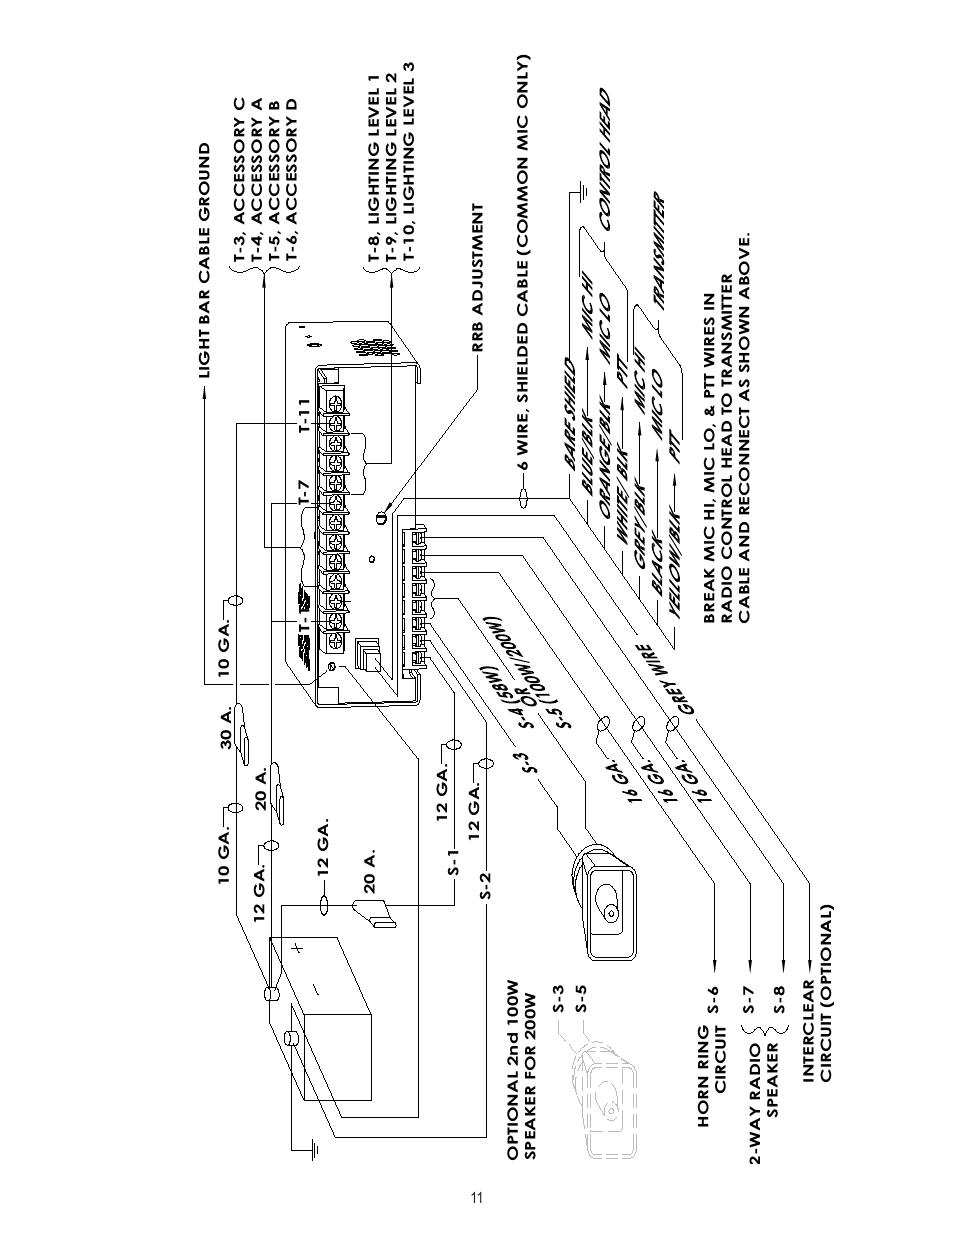 medium resolution of code 3 vcon wiring wiring diagrams code 3 model 3050 code 3 vcon siren wiring diagram